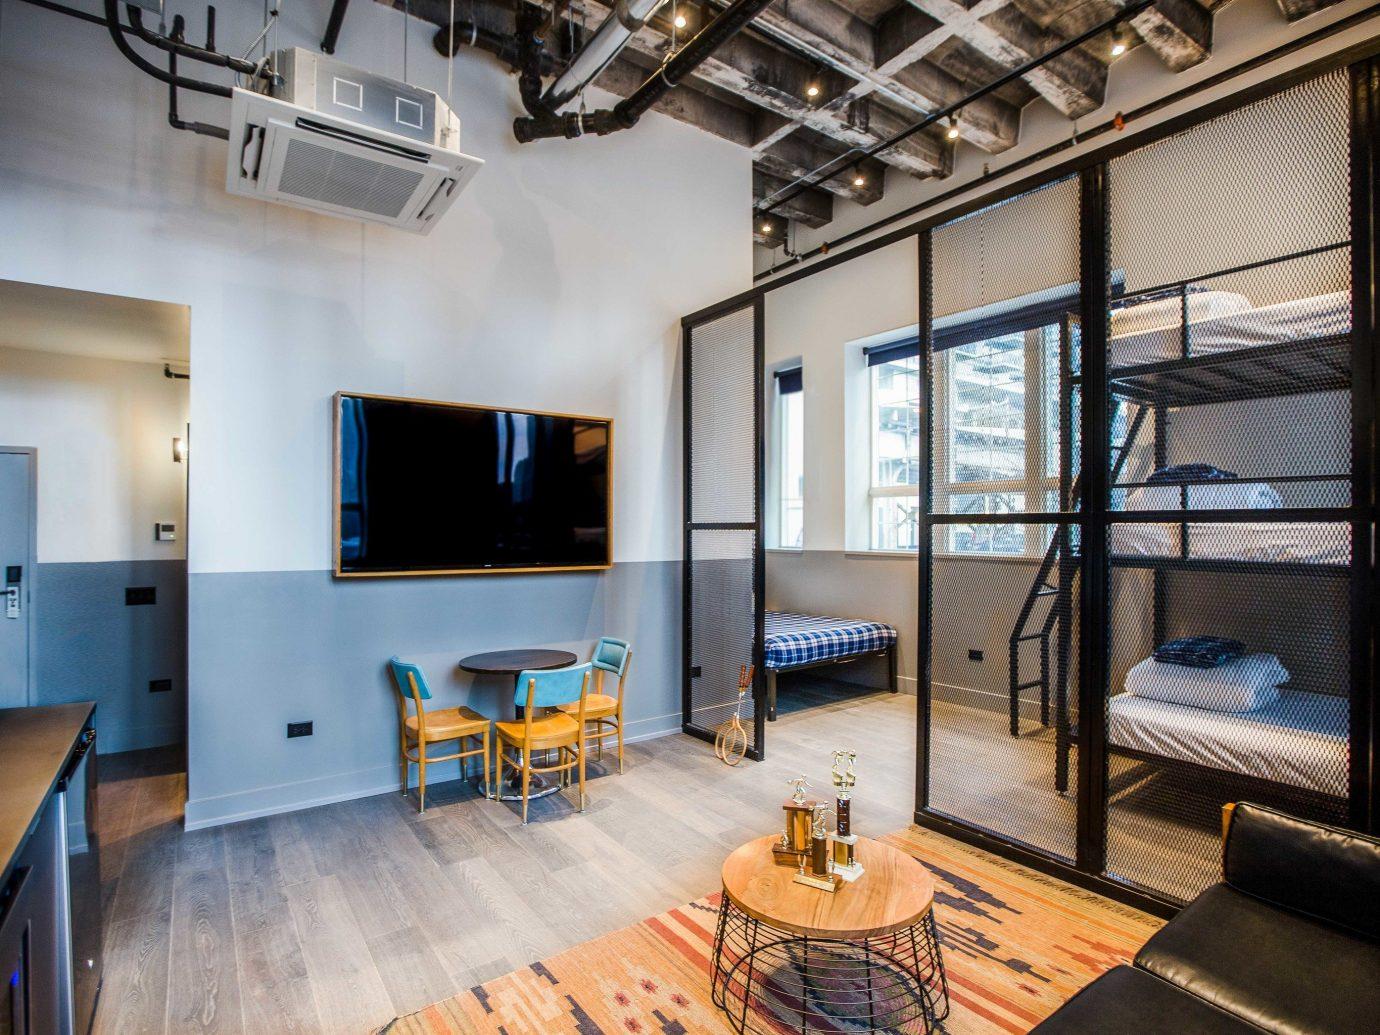 Trip Ideas indoor floor wall room Living interior design ceiling real estate loft living room apartment furniture area